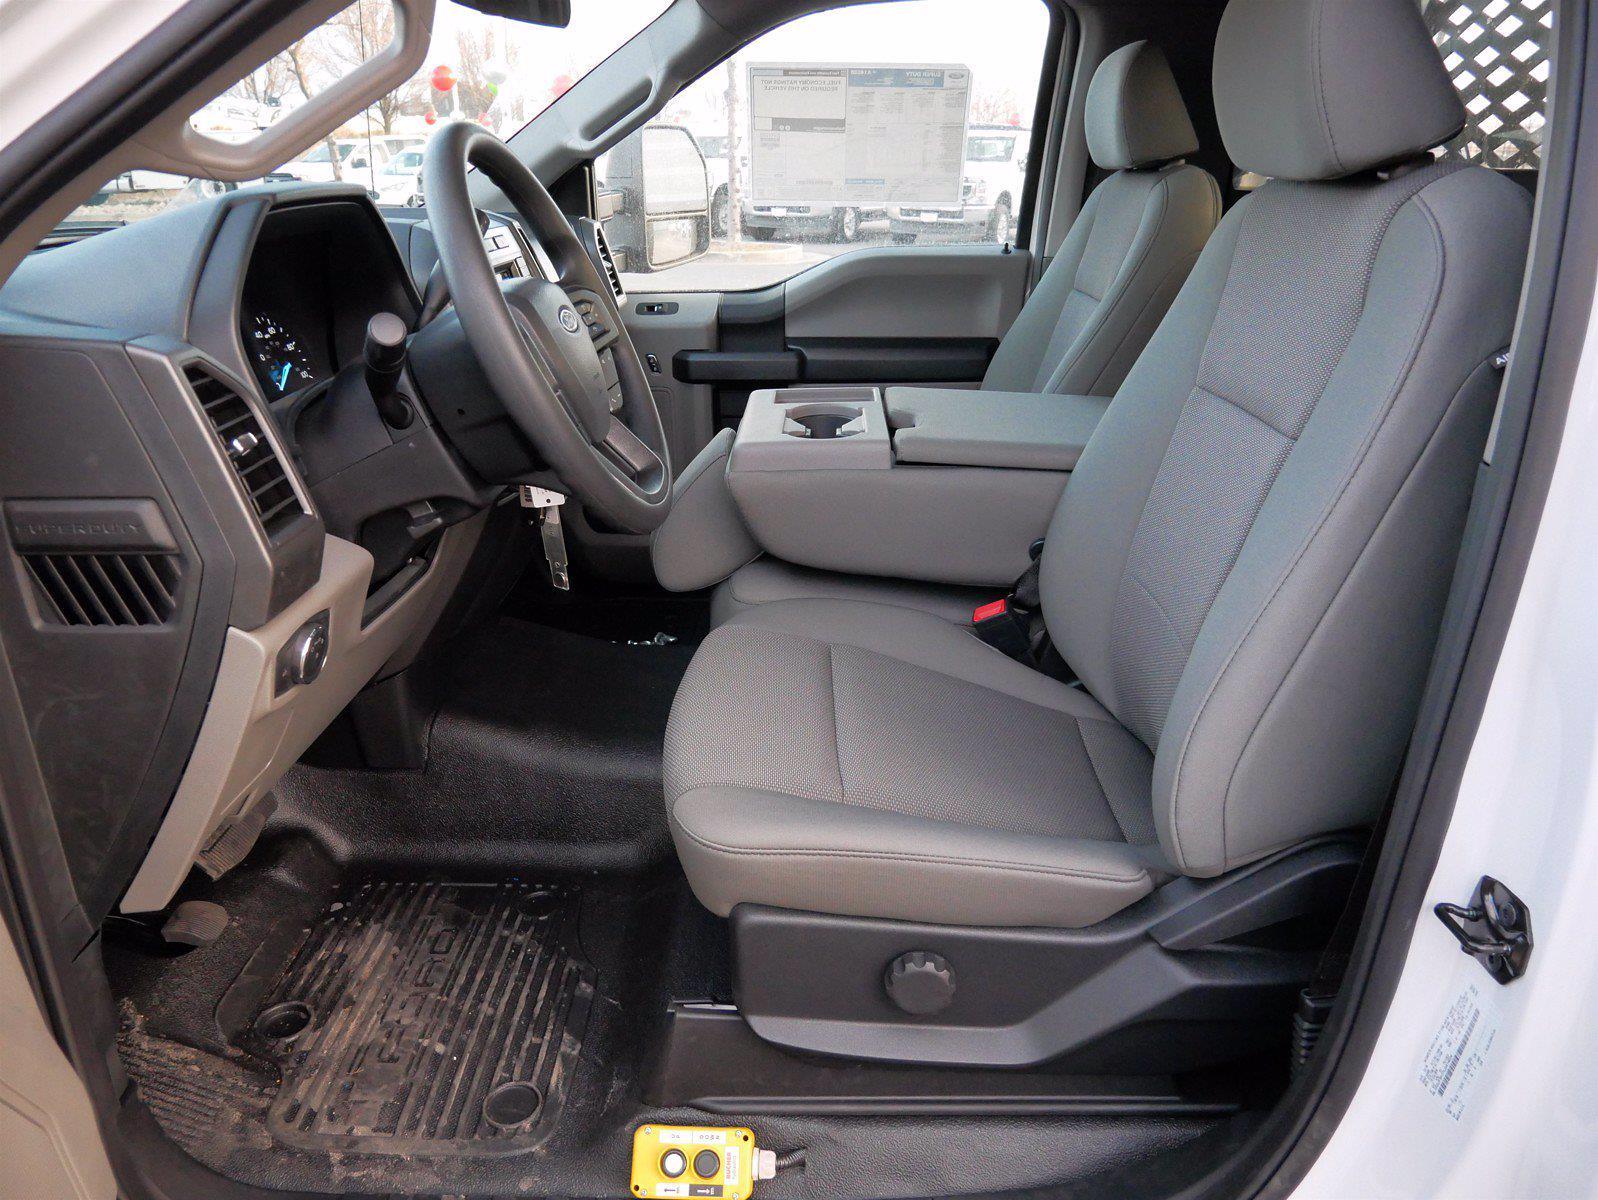 2021 Ford F-550 Regular Cab DRW 4x4, Scelzi Dump Body #64096 - photo 14